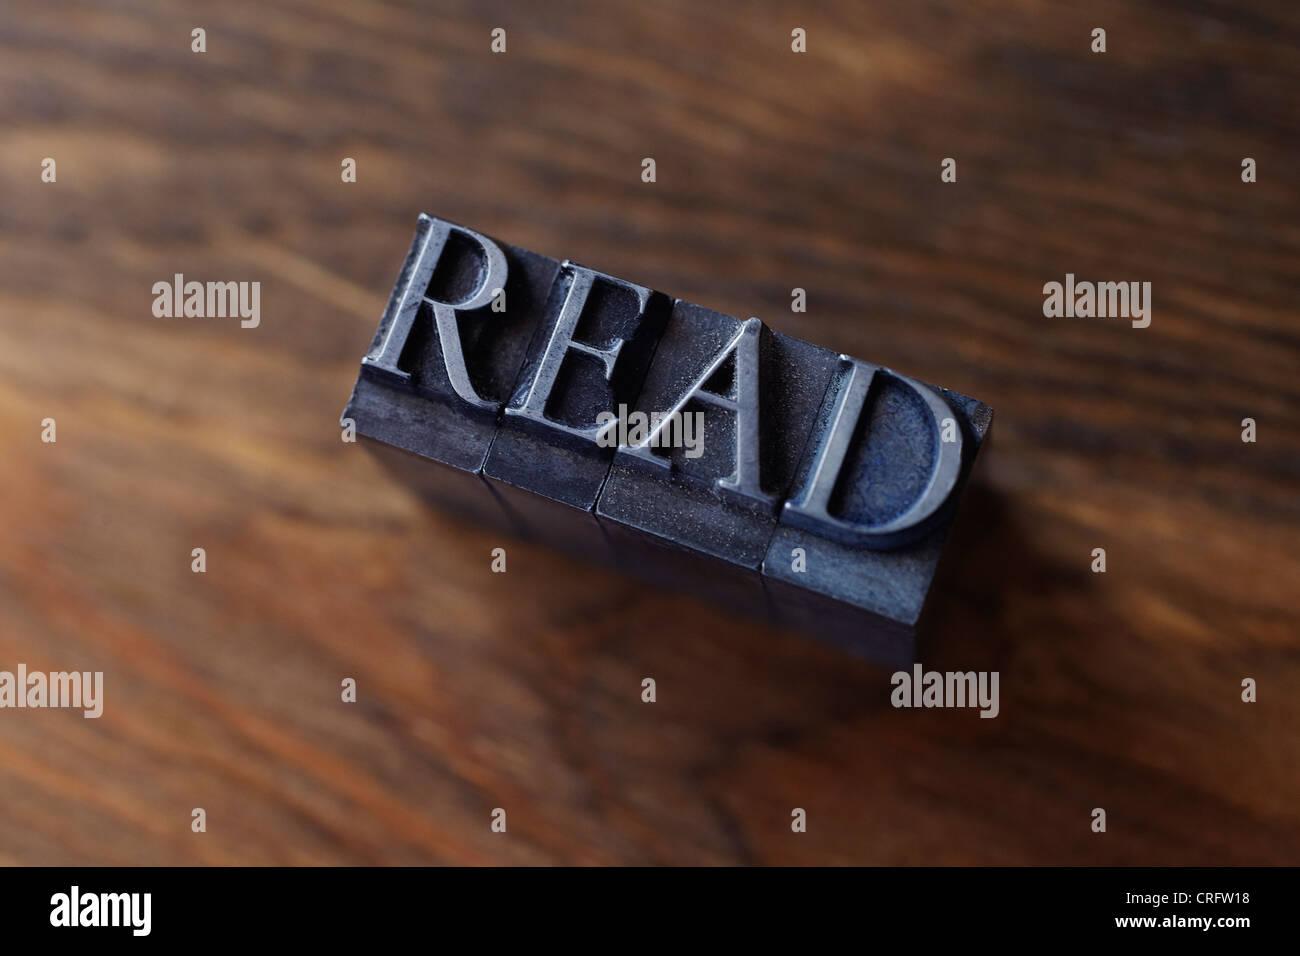 Lead type spelling 'read' - Stock Image